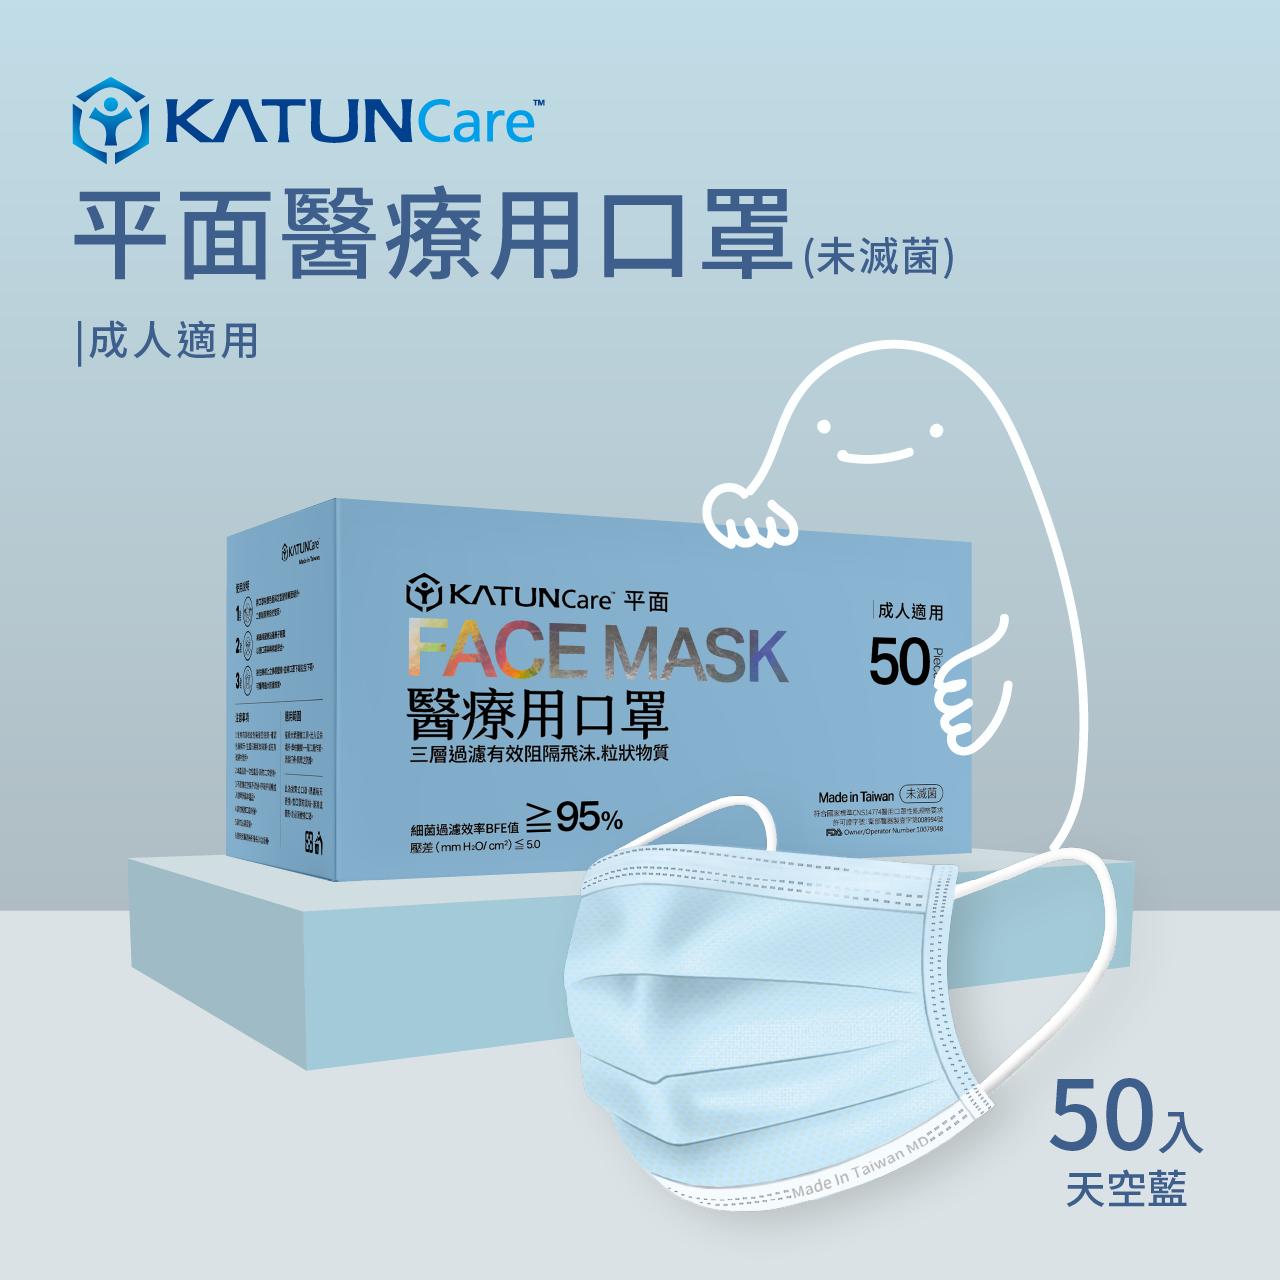 【KatunCare】平面醫療用口罩-成人款 藍色(50入/盒)